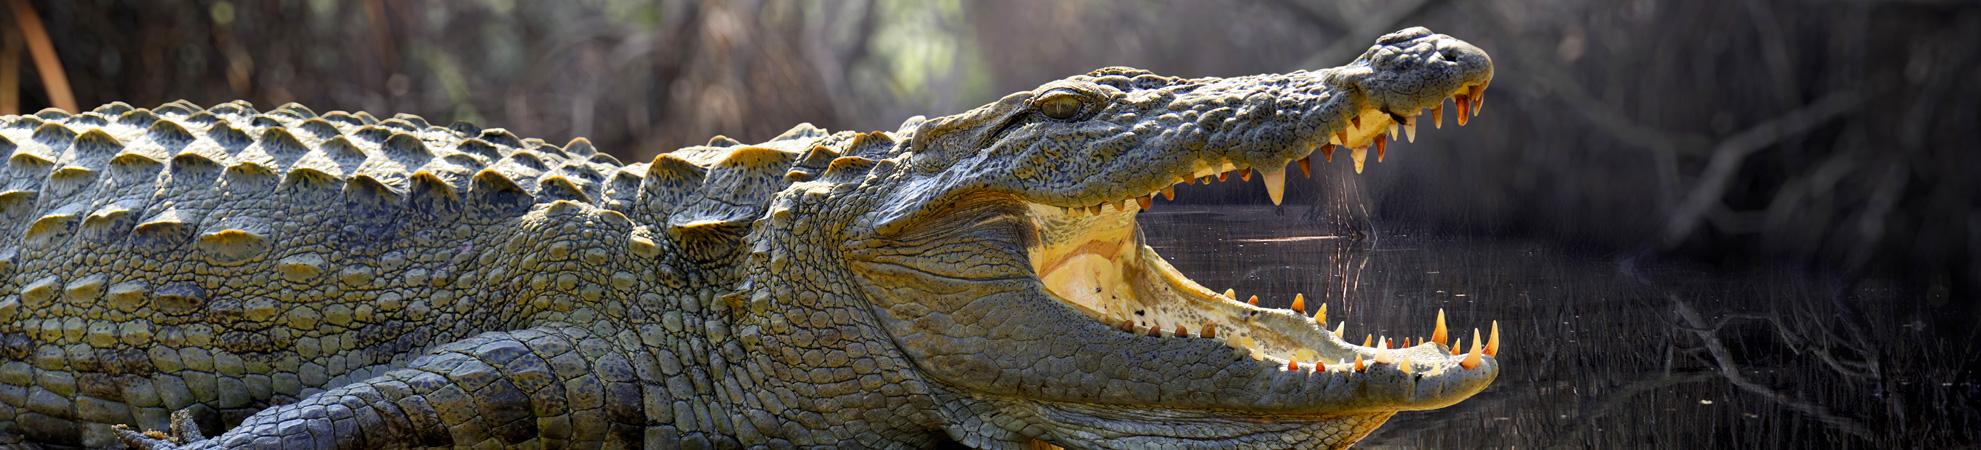 Les risques naturels au Sri Lanka